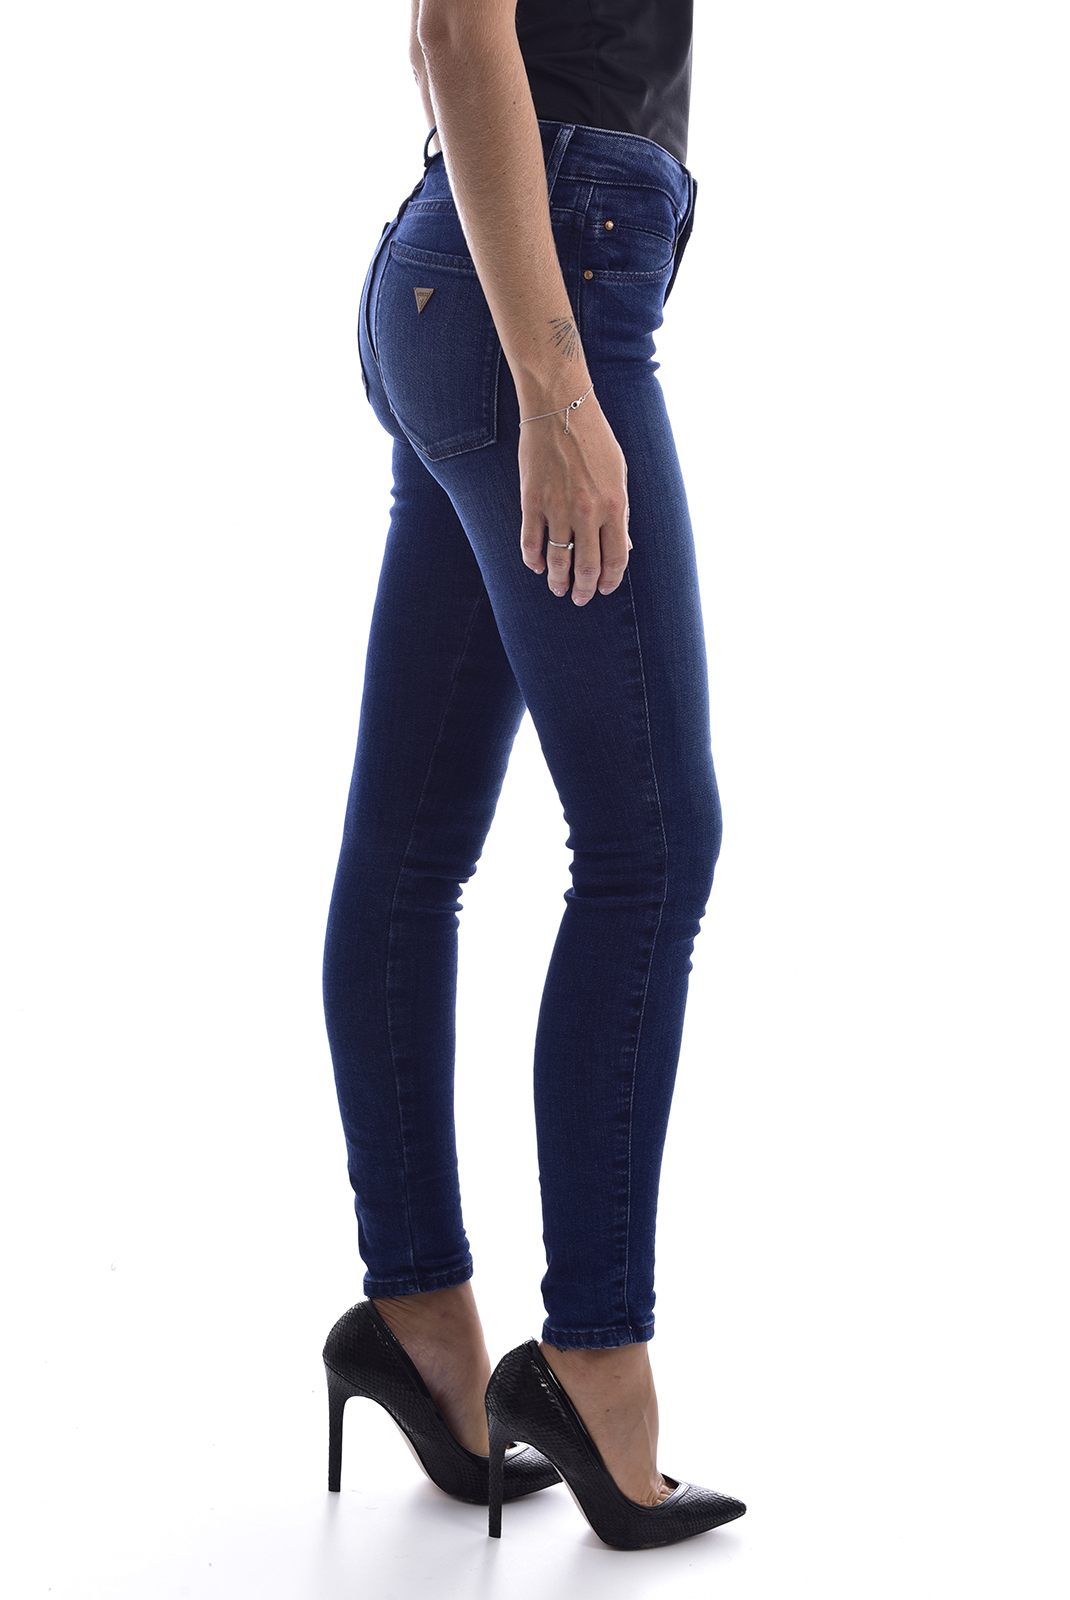 Femme  Guess jeans WB9AJ3D3NQ0 SEXY CURVE DAIN WASH